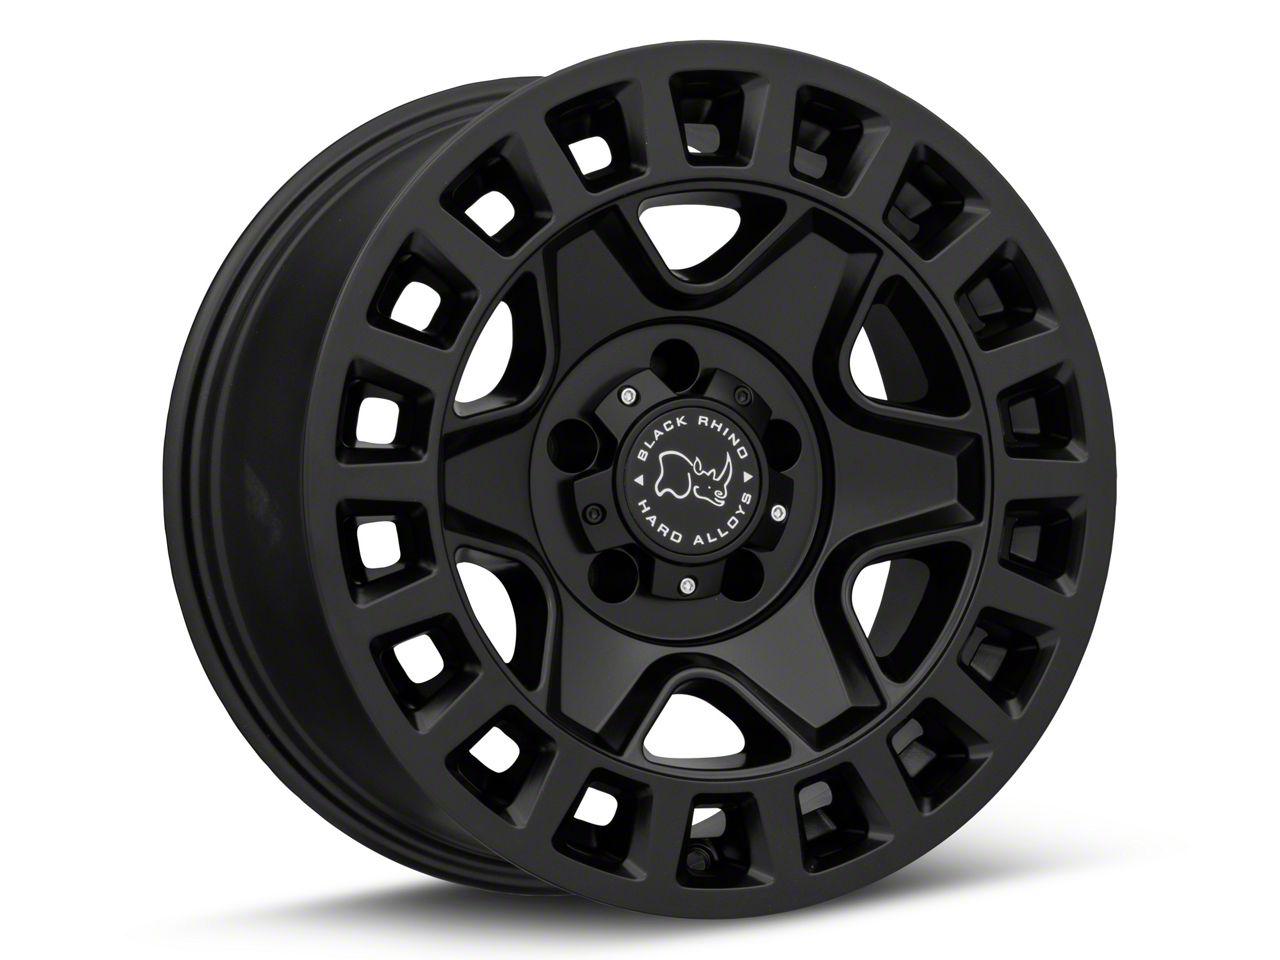 Black Rhino York Matte Black Wheel - 18x9 (07-18 Jeep Wrangler JK; 2018 Jeep Wrangler JL)